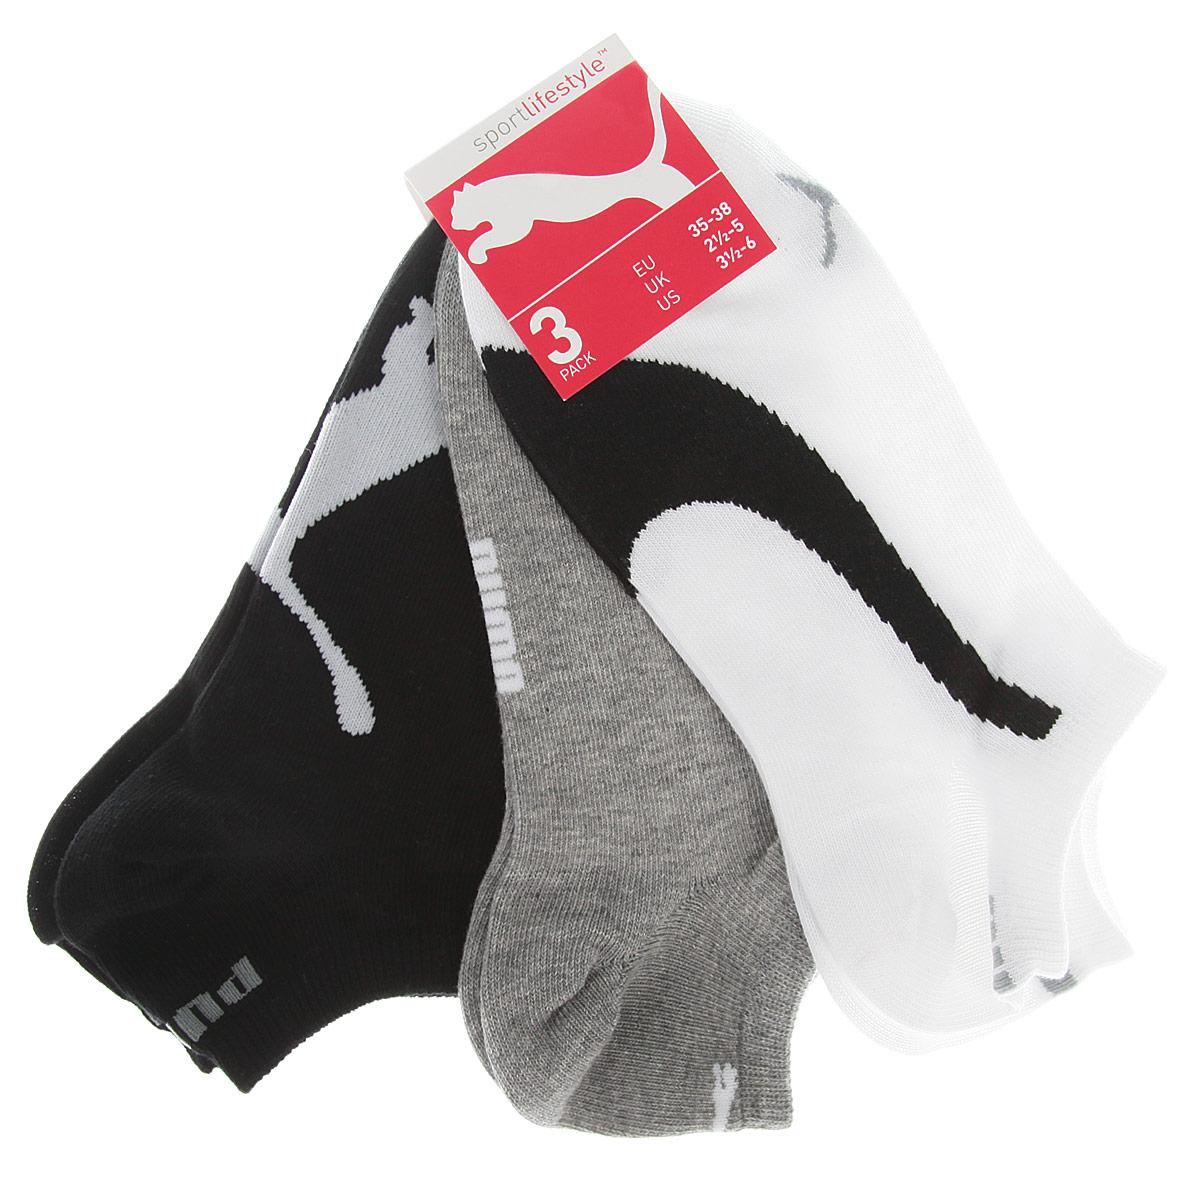 Носки унисекс Puma Lifestyle Sneakers, цвет: белый, серый, черный, 3 пары. 88641201. Размер 39/42 кошельки puma кошелёк rbr lifestyle wallet